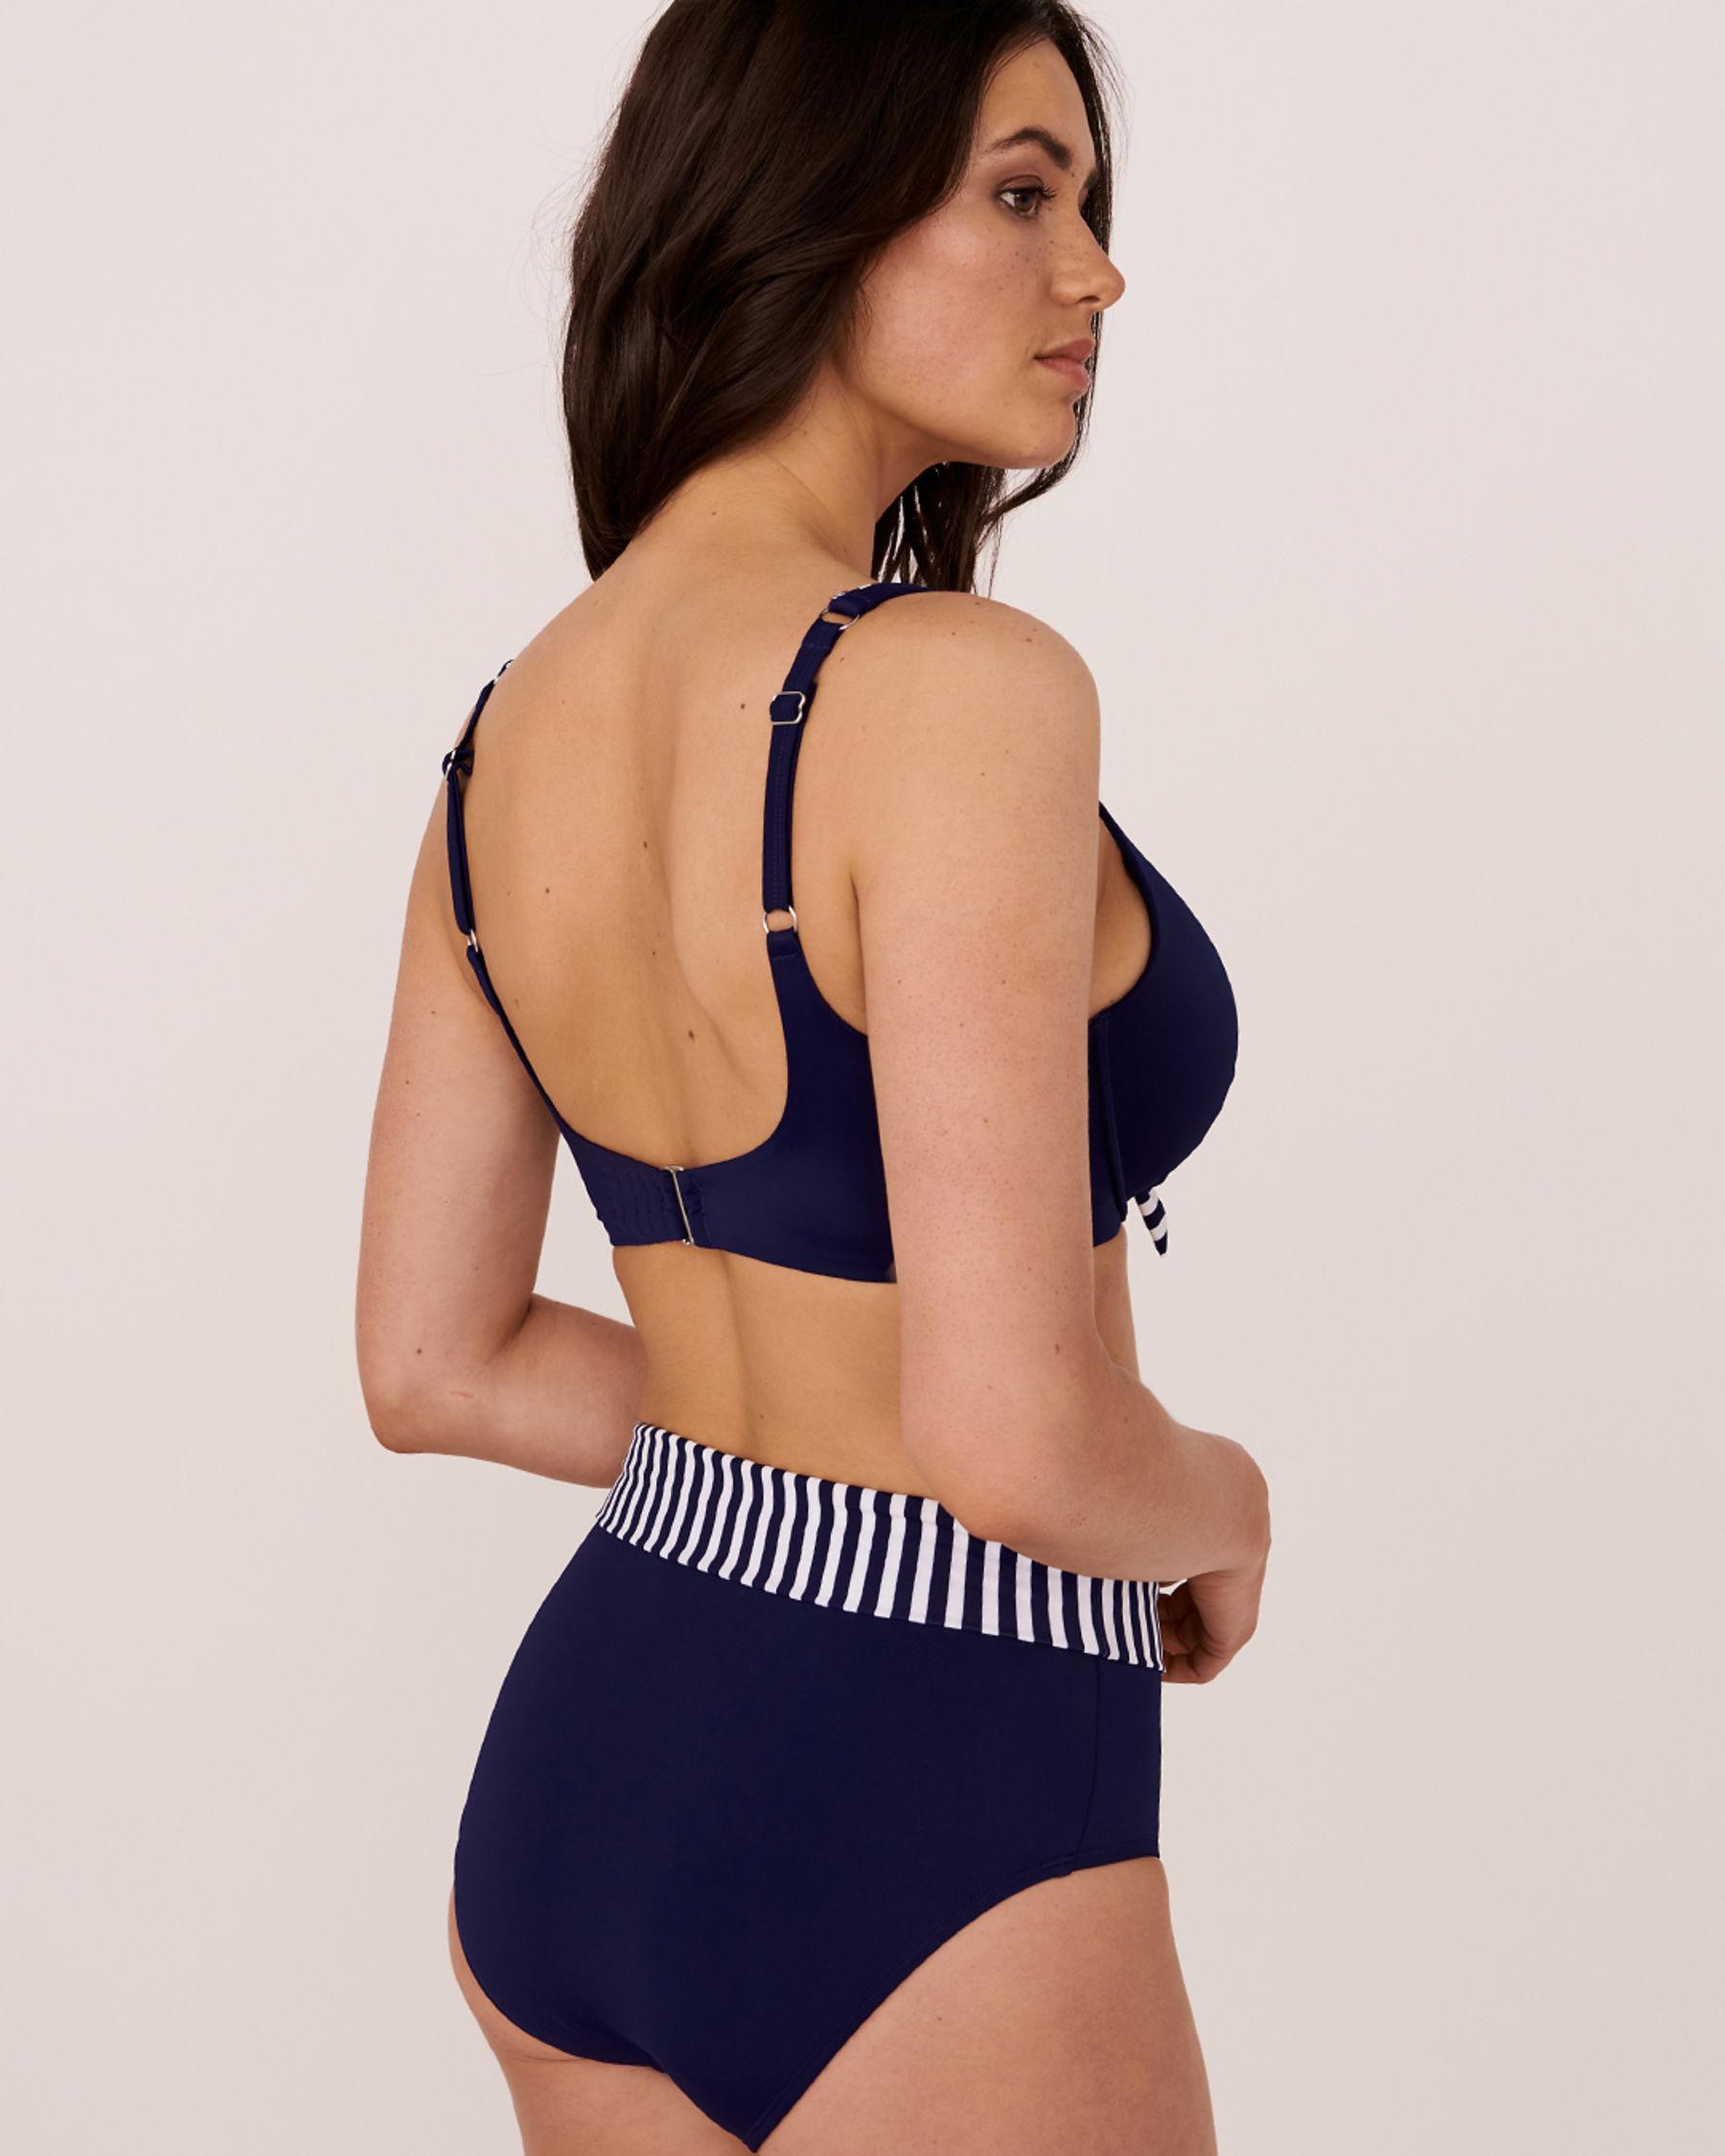 LA VIE EN ROSE AQUA Haut de bikini bonnet D COSMO Bleu 671-681-0-0P - Voir4